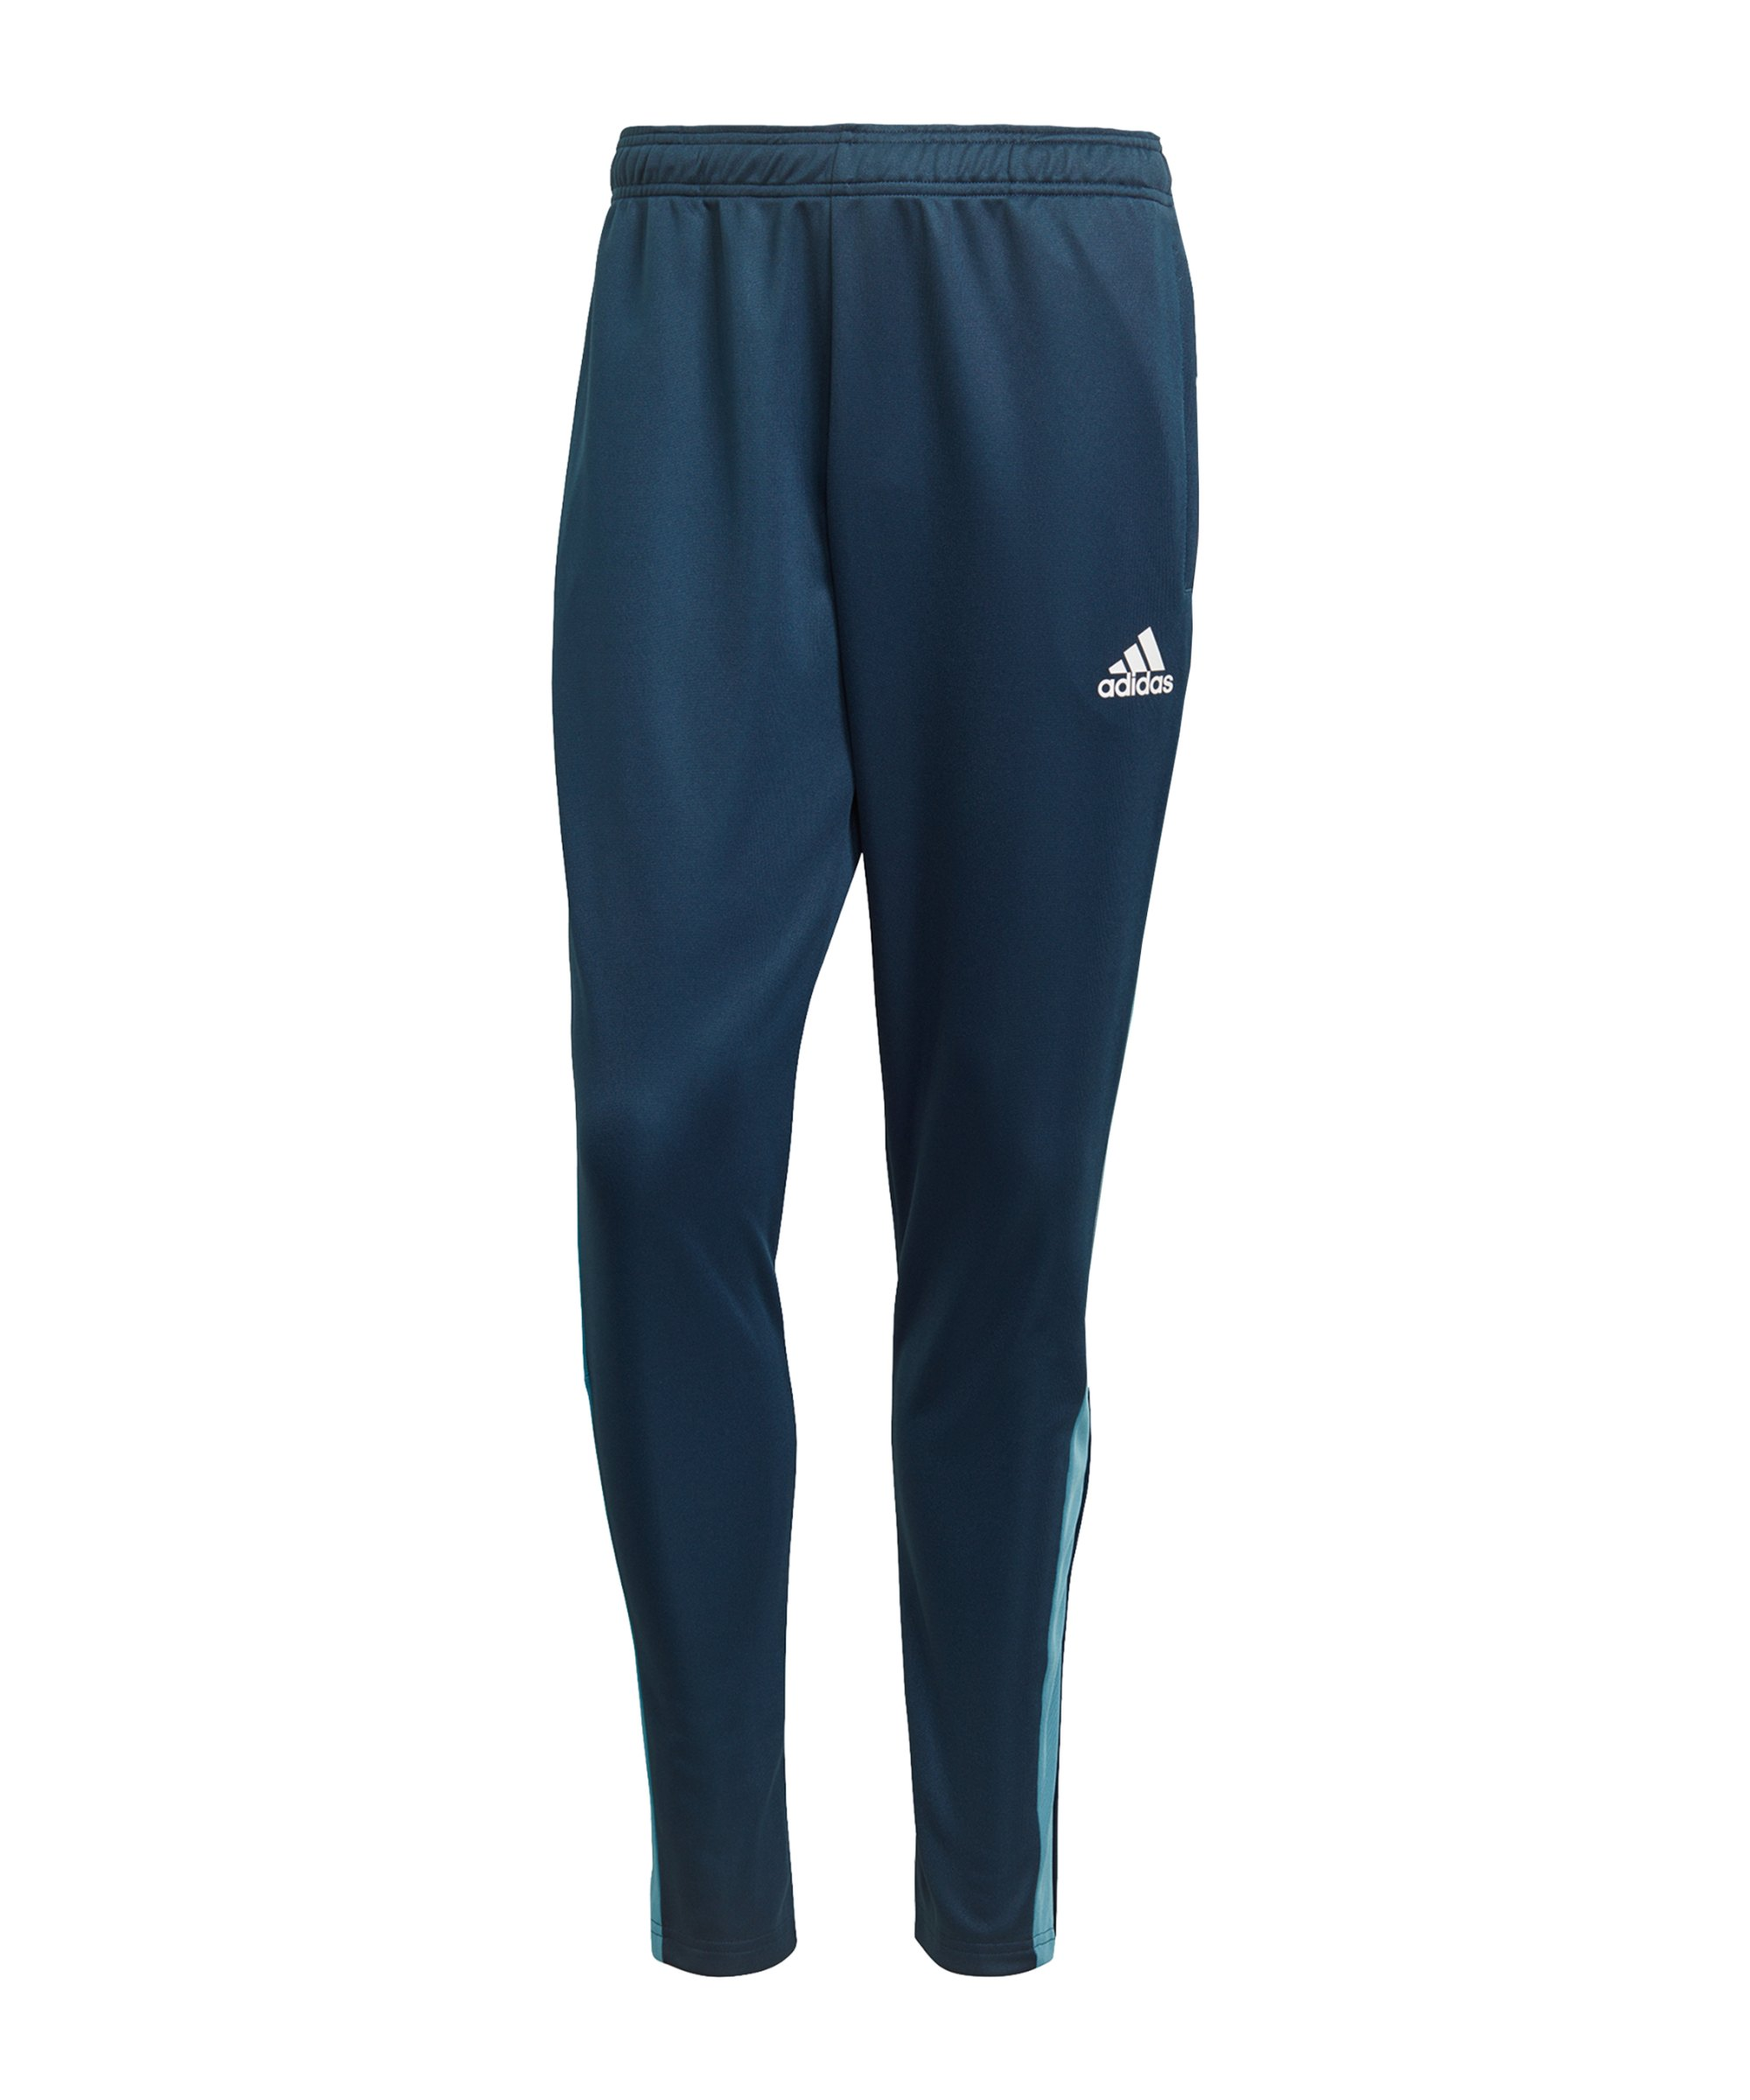 adidas Tiro Trainingshose Blau Weiss - blau